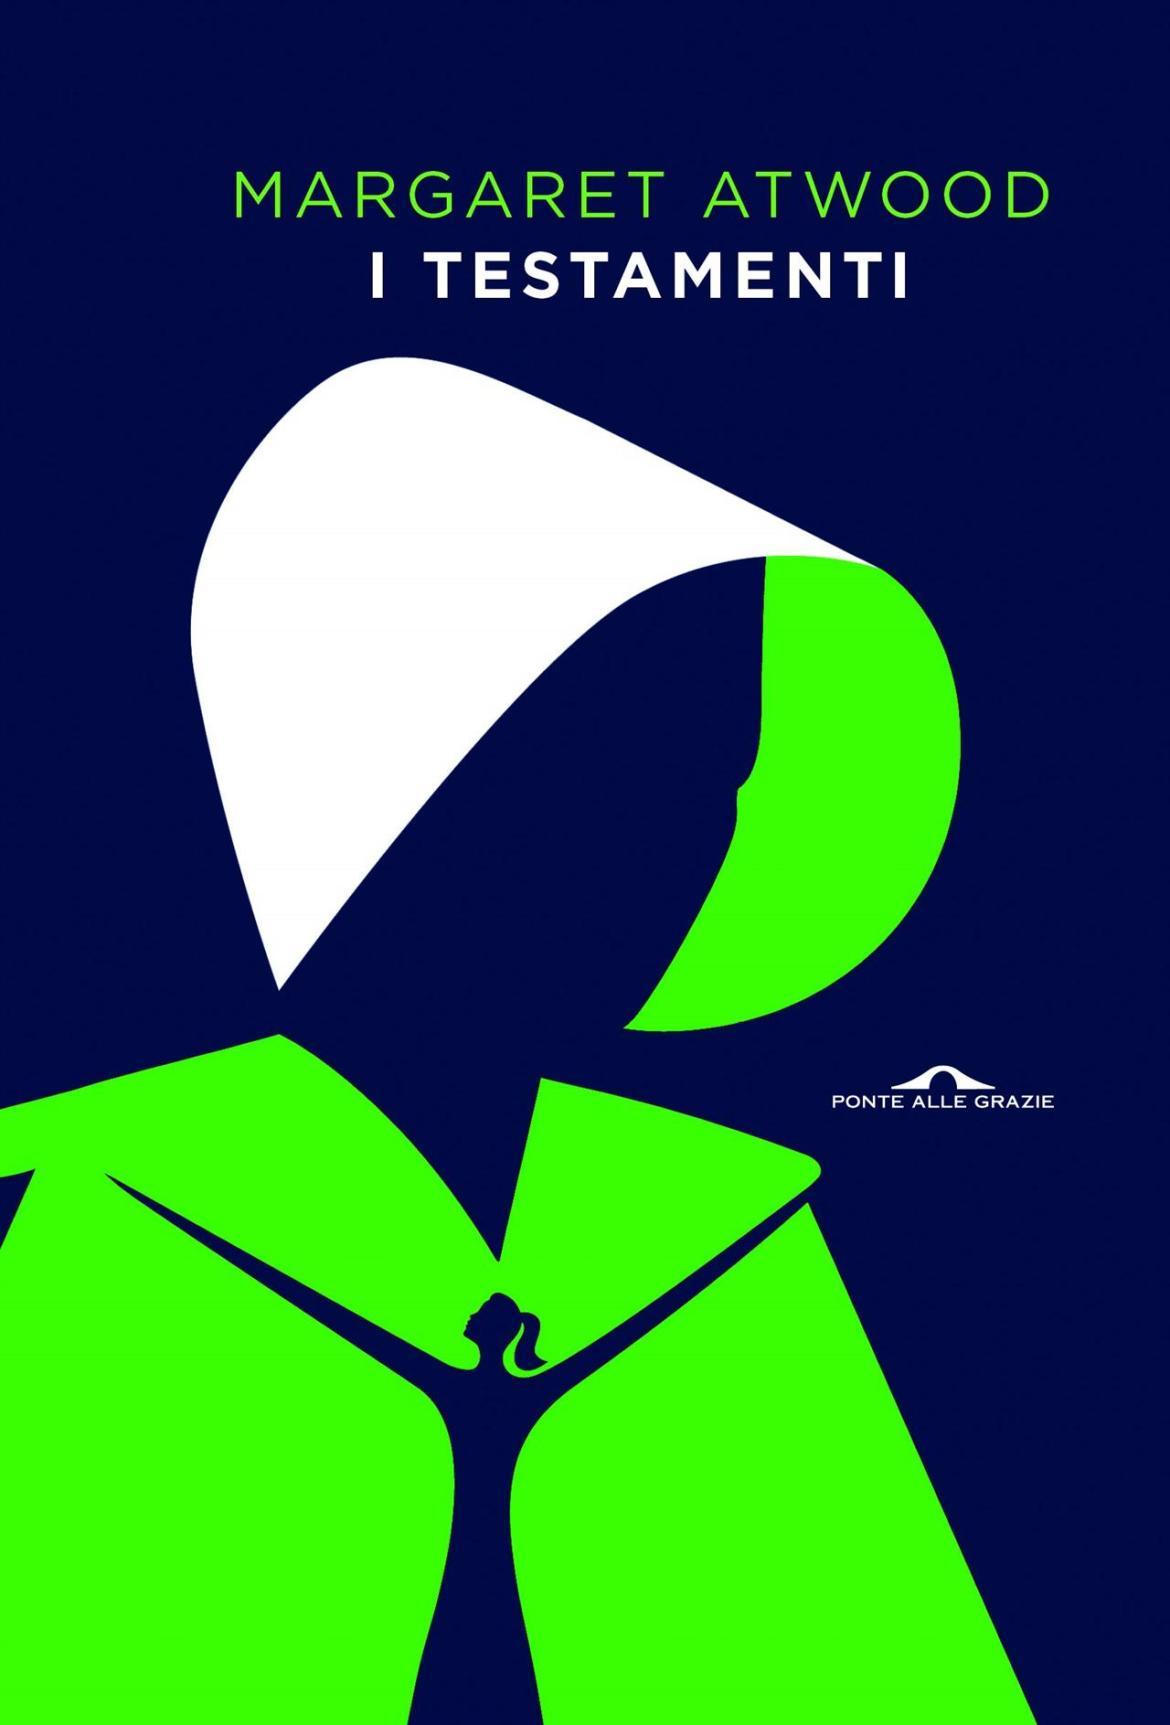 Margaret Atwood - i testamenti